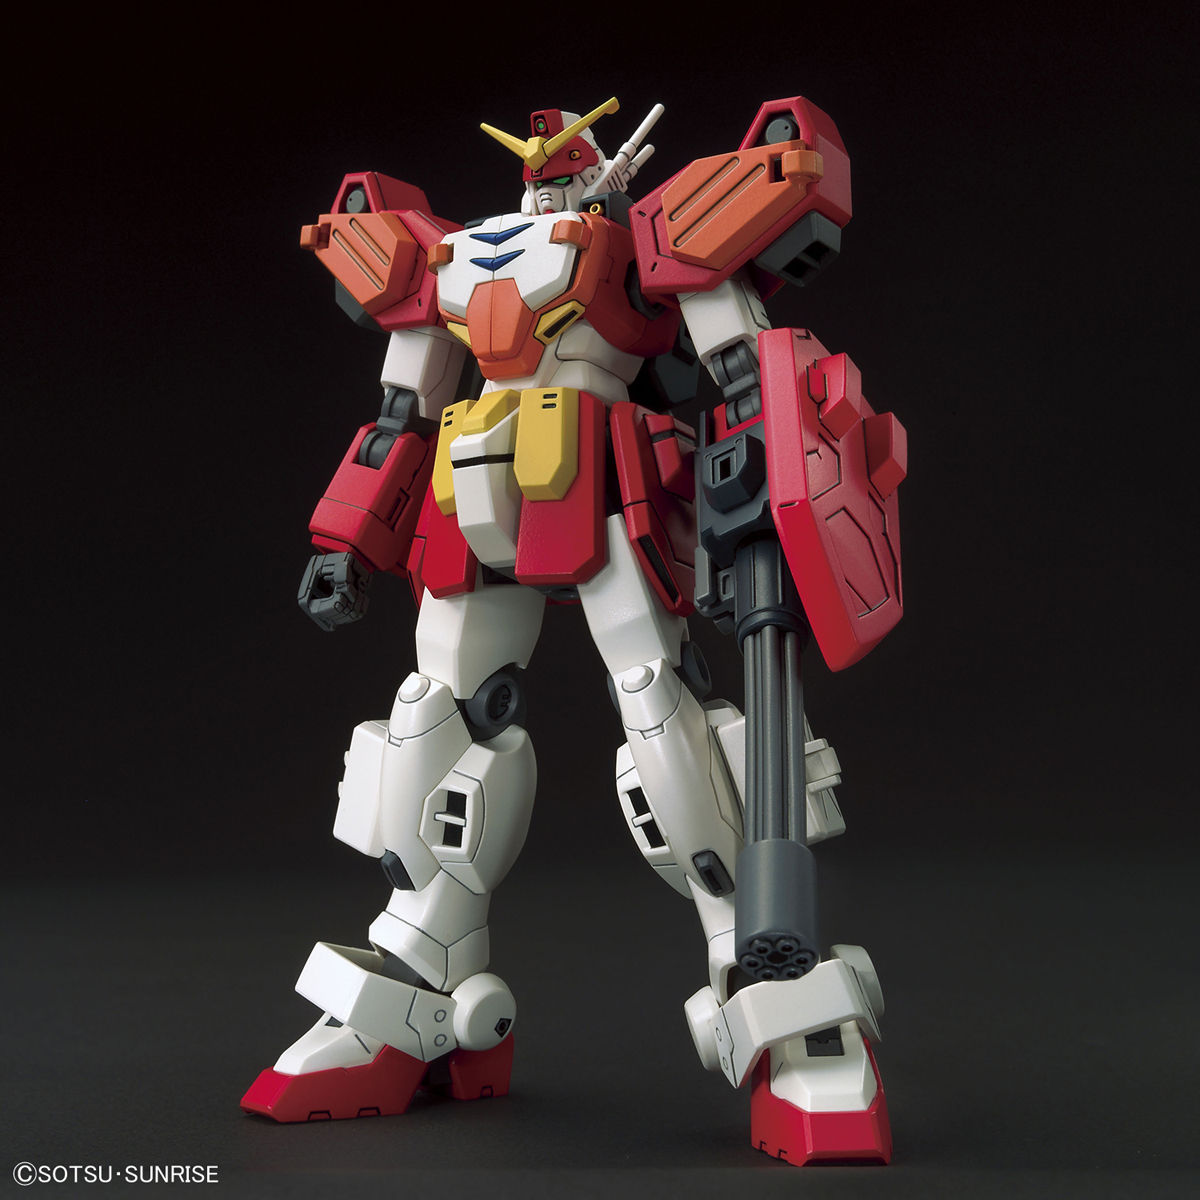 HGAC 1/144 XXXG-01H ガンダムヘビーアームズ [Gundam Heavyarms] 5060745 4573102607454